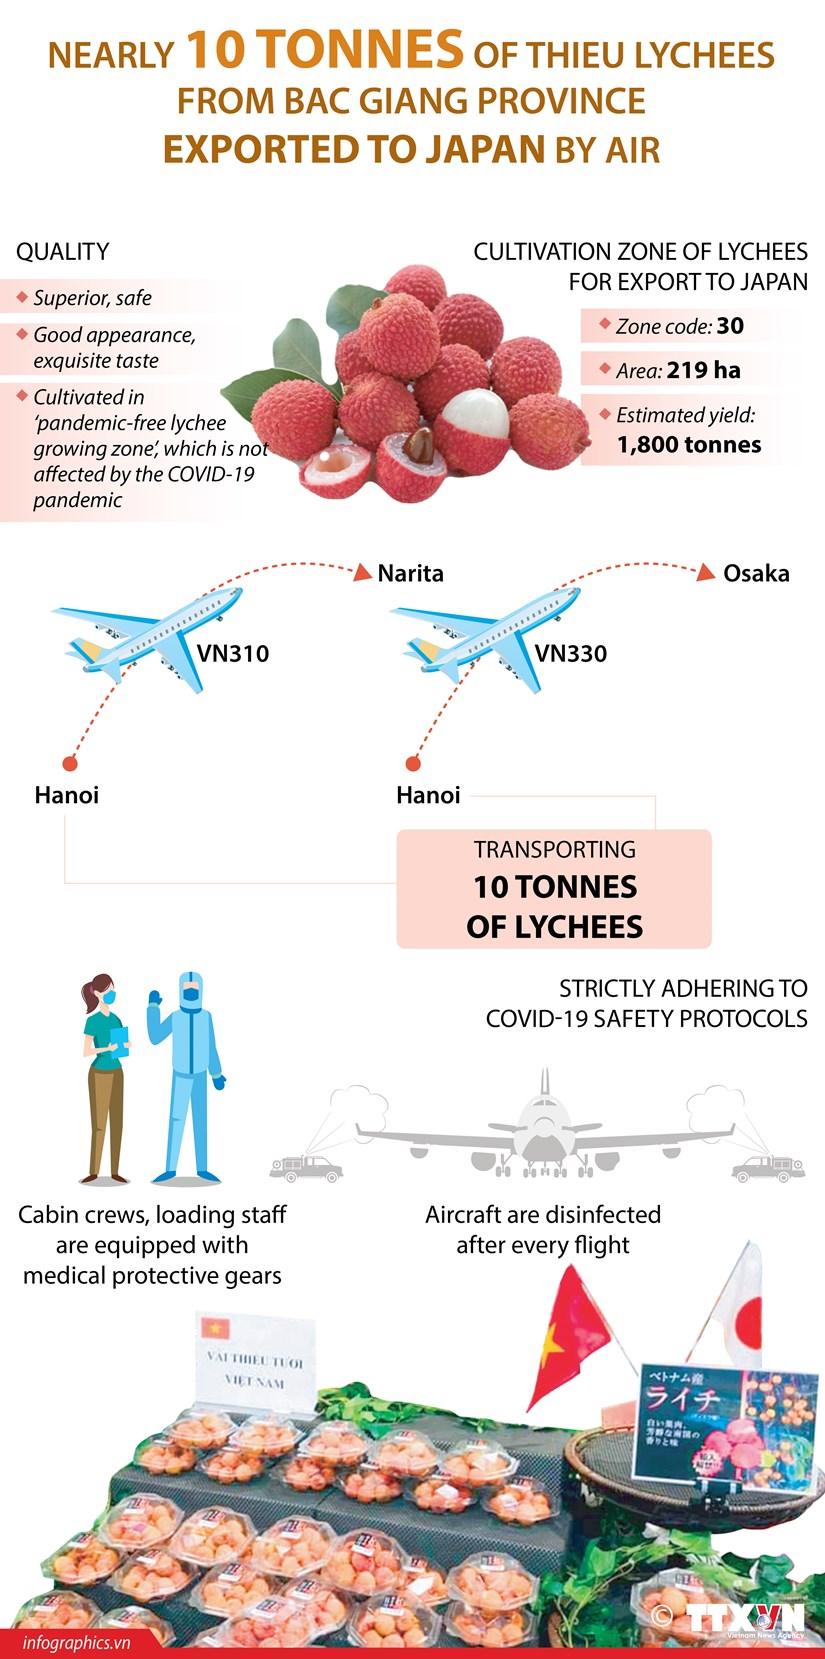 Bac Giang exports nearly 10 tonnes of Thieu lychees to Japan hinh anh 1